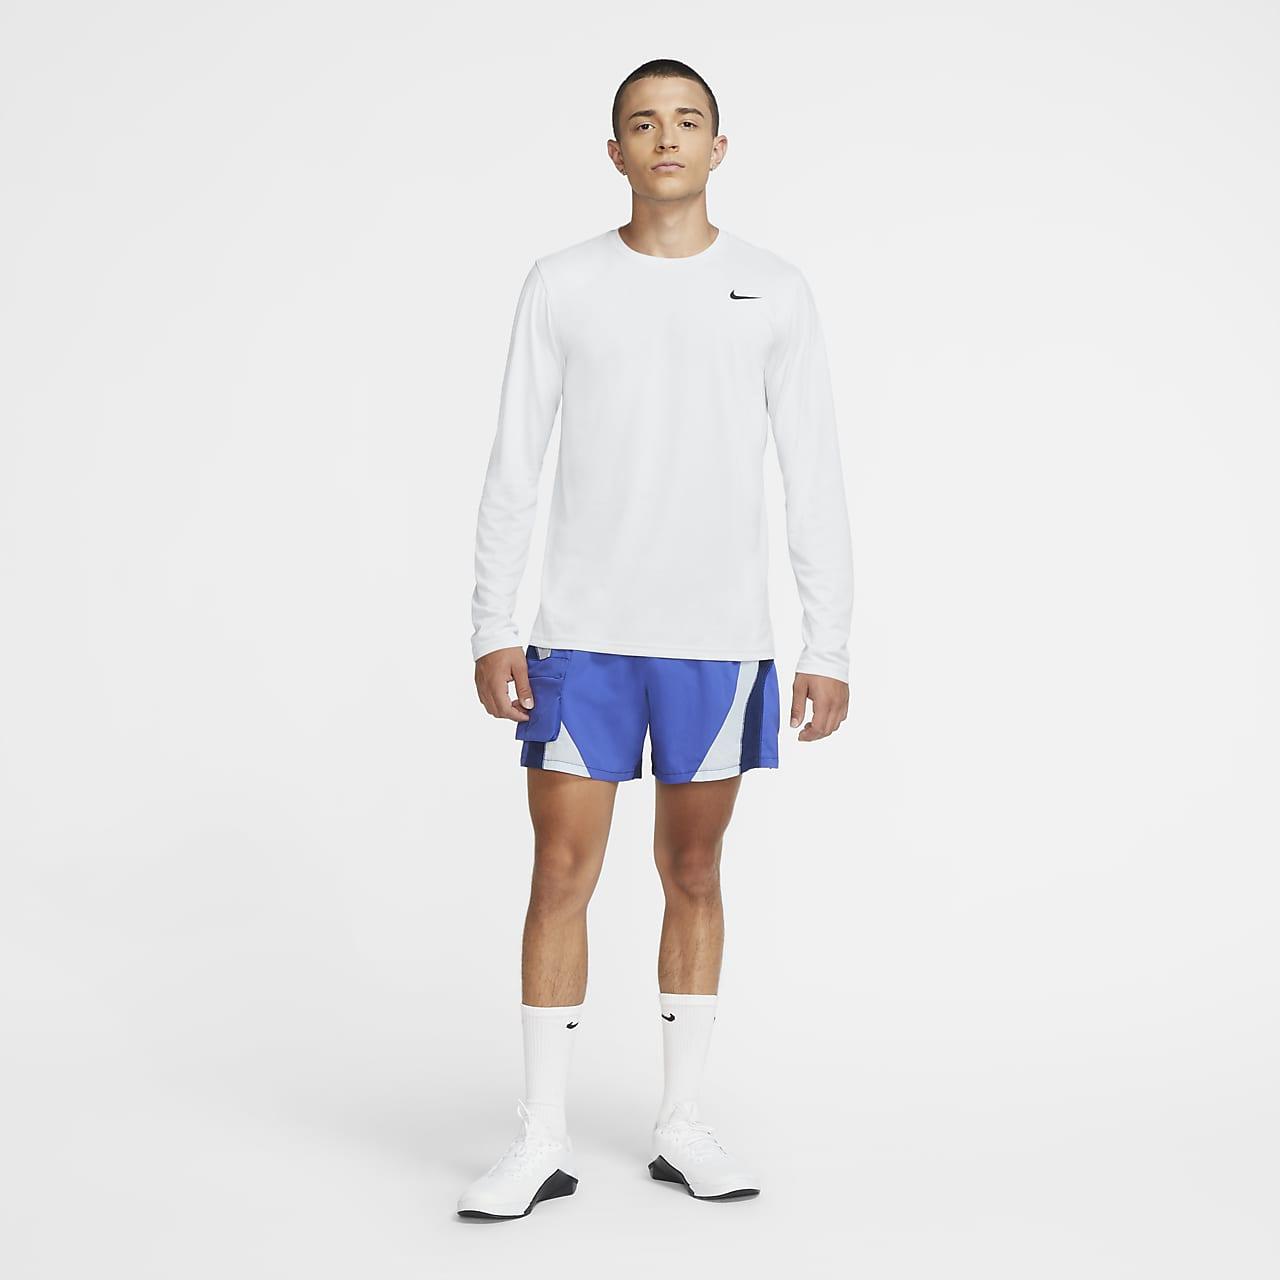 1cbf37b6 Nike Dri-FIT Legend 2.0 Men's Long-Sleeve Training Top. Nike.com